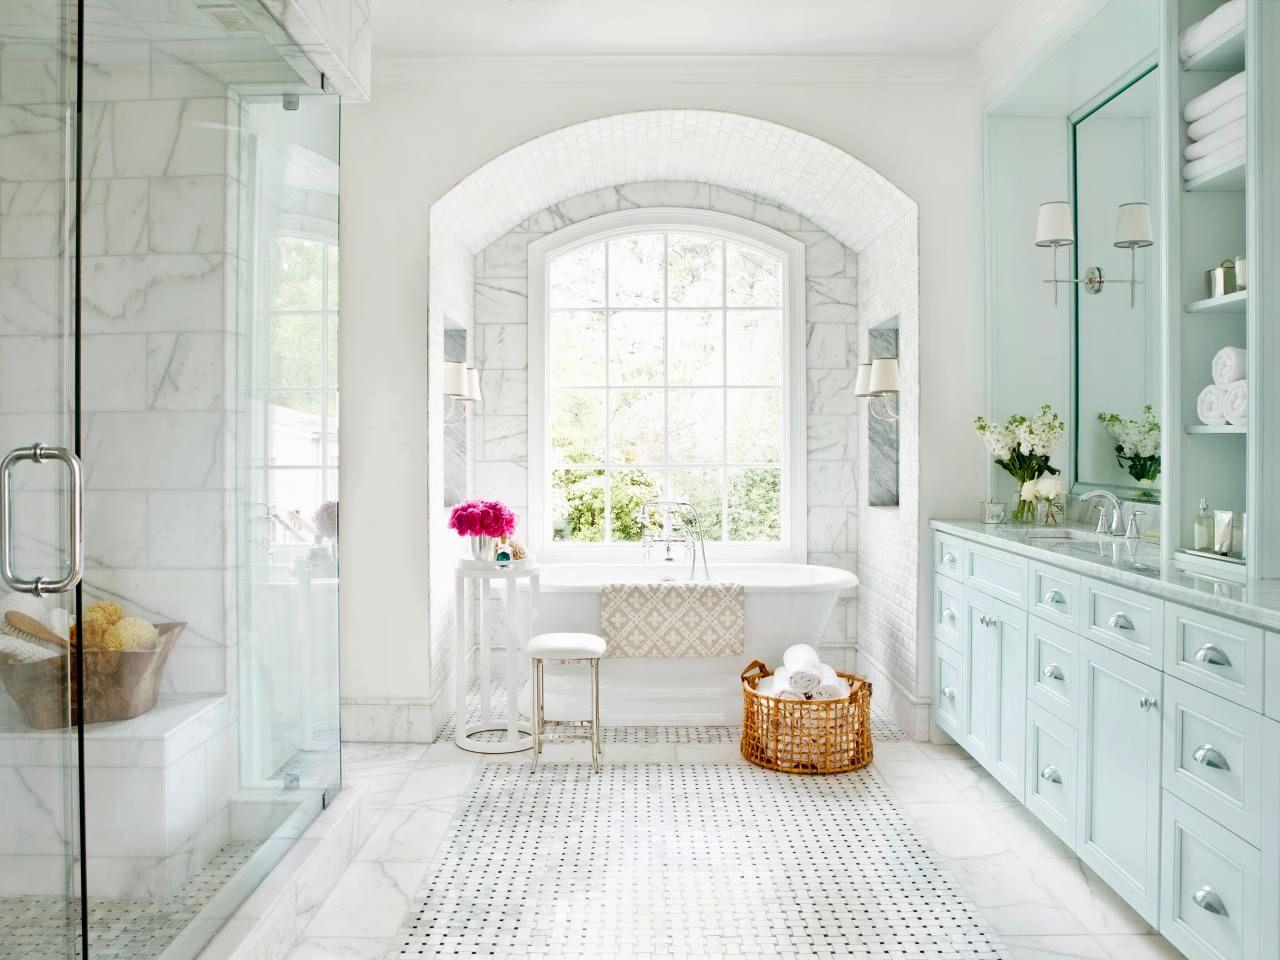 amazing bathroom medicine cabinet pattern-Fascinating Bathroom Medicine Cabinet Layout